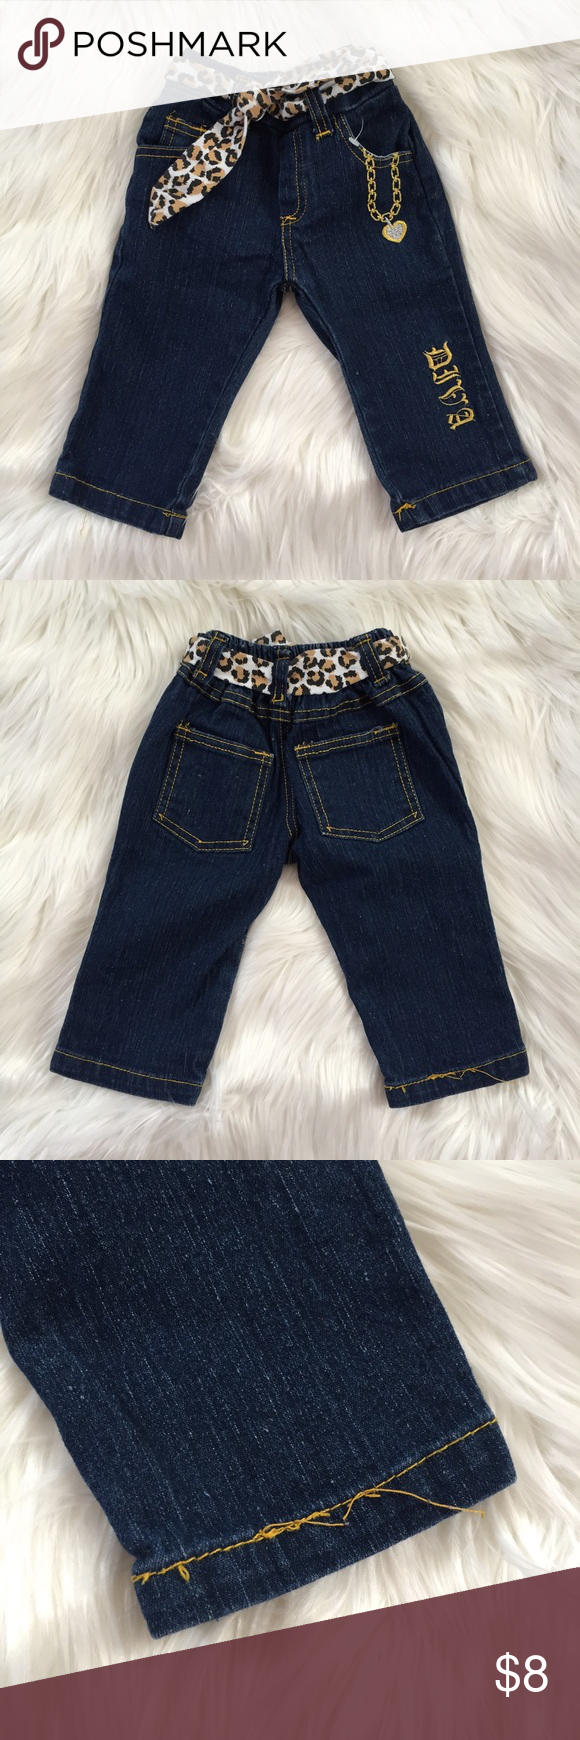 "Baby Girl ""Diva"" Jeans Adorable Jeans NWOT , say ""DIVA"" on left leg. Bottoms Jeans"